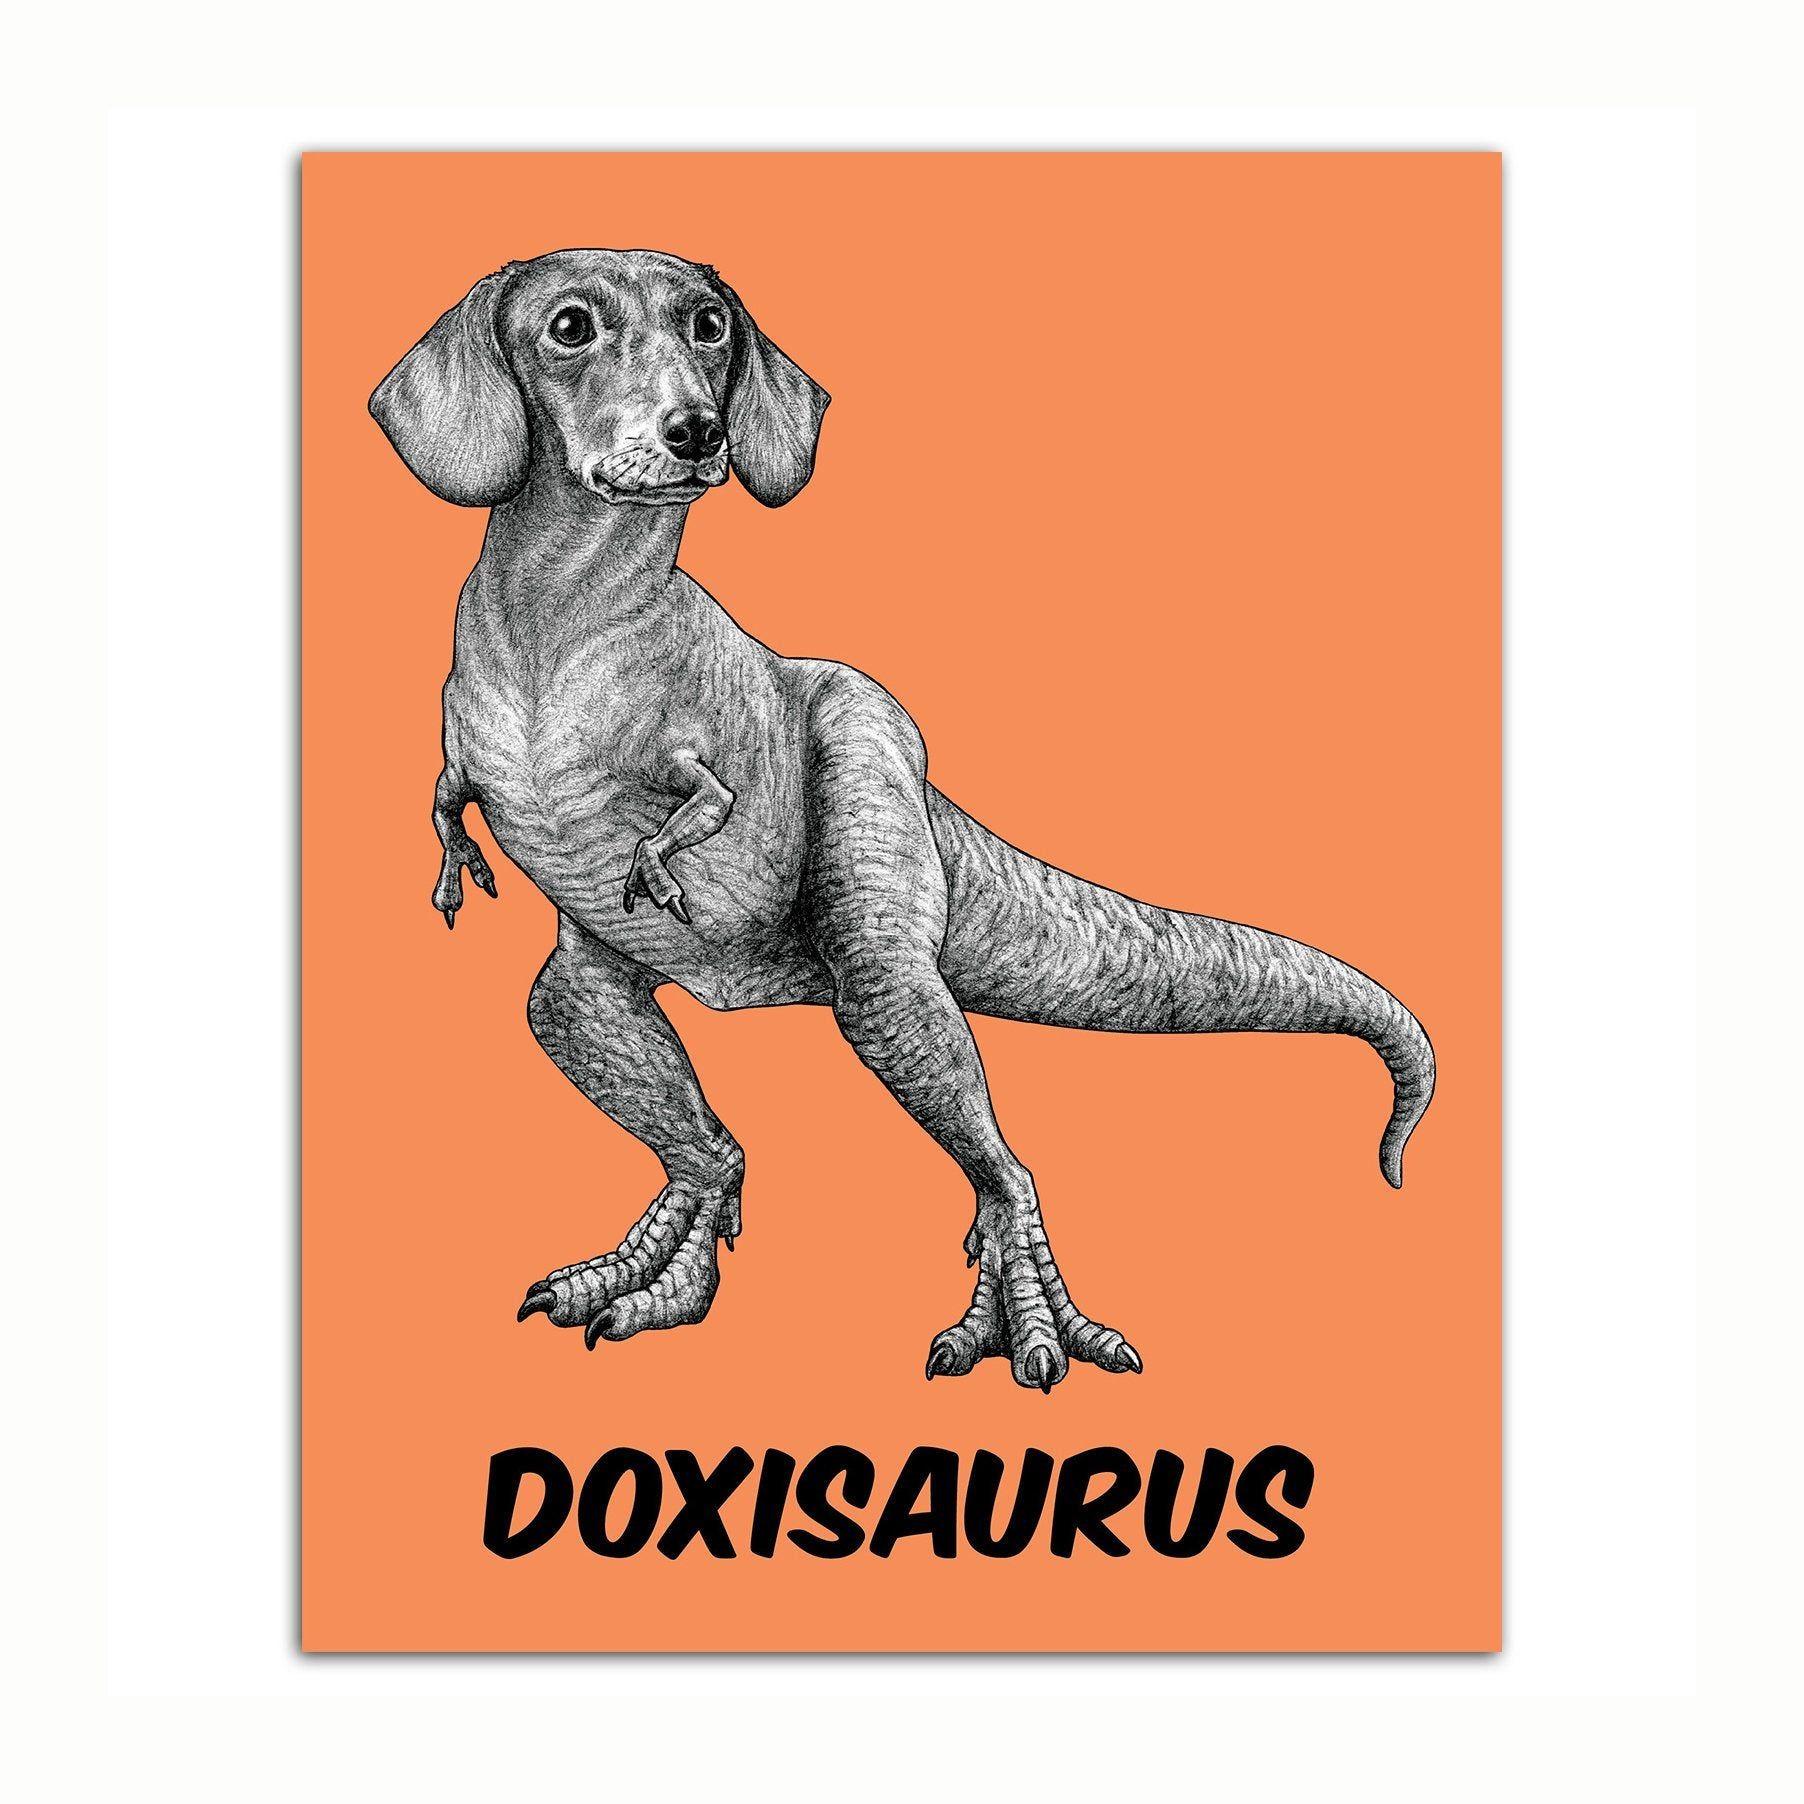 Doxisaurus 8x10 Art Print Dachshund + TRex Hybrid Animal